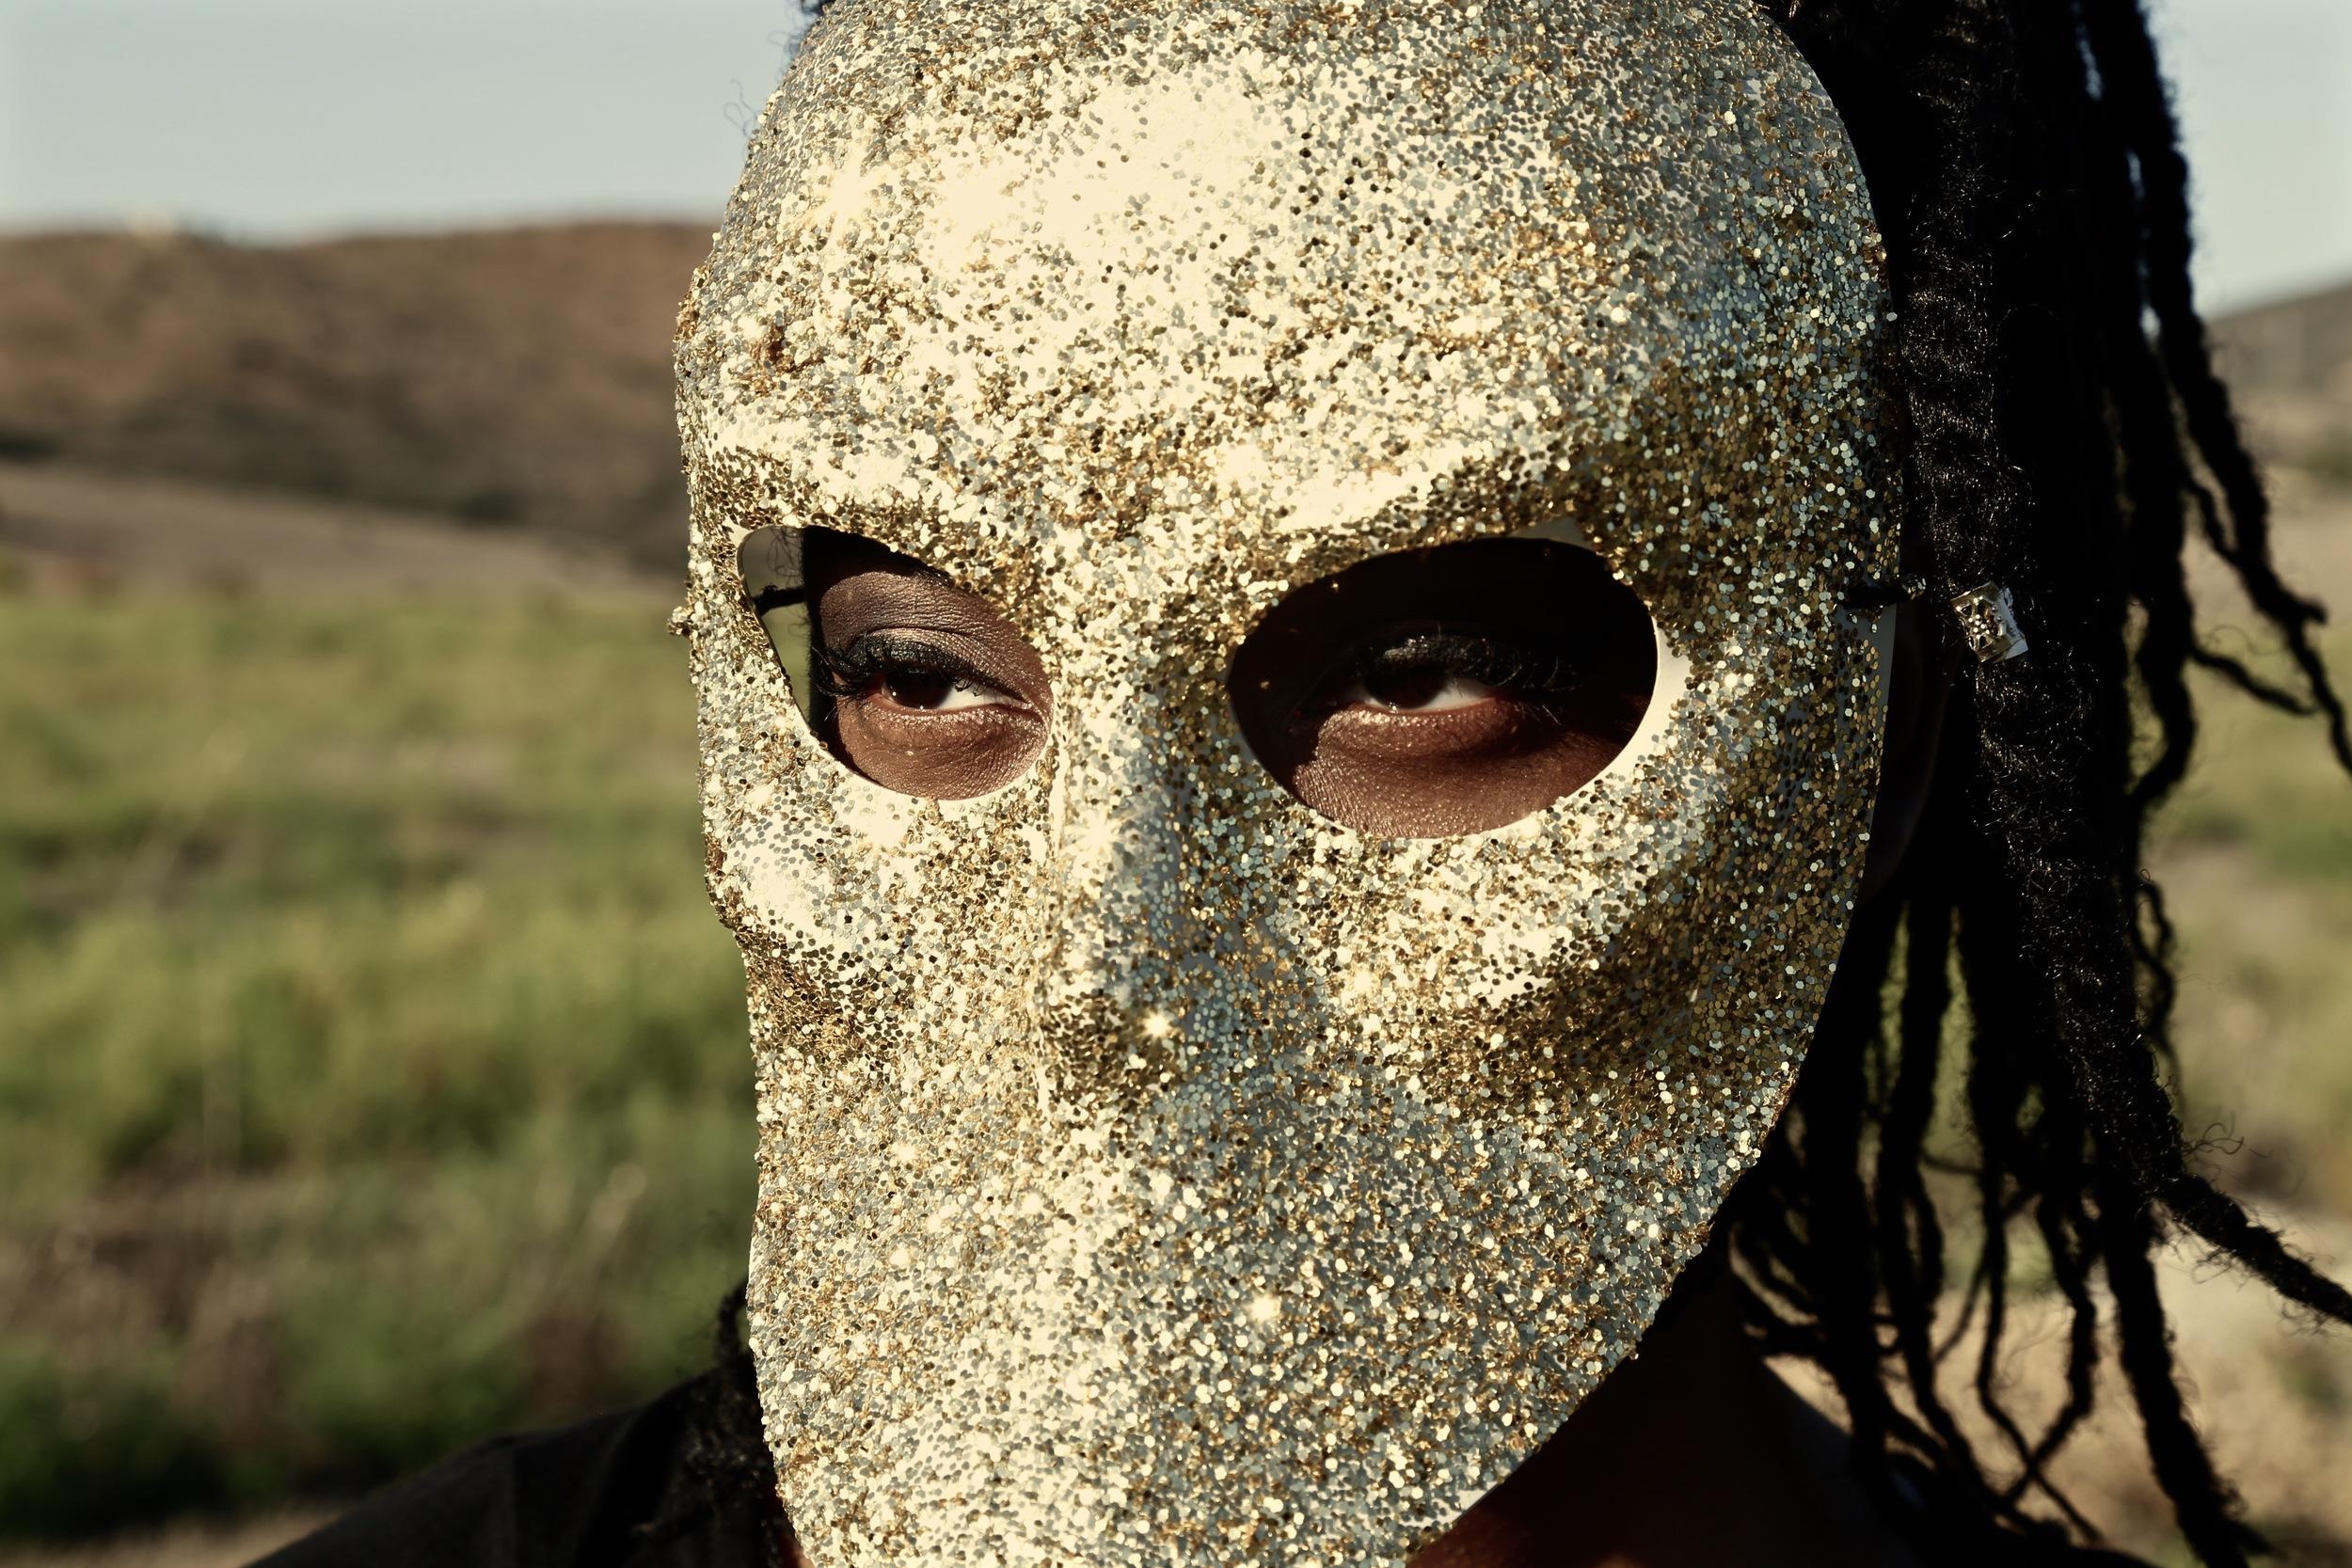 UNTITLED | GOLD | 2015 | SYDNEY LEE